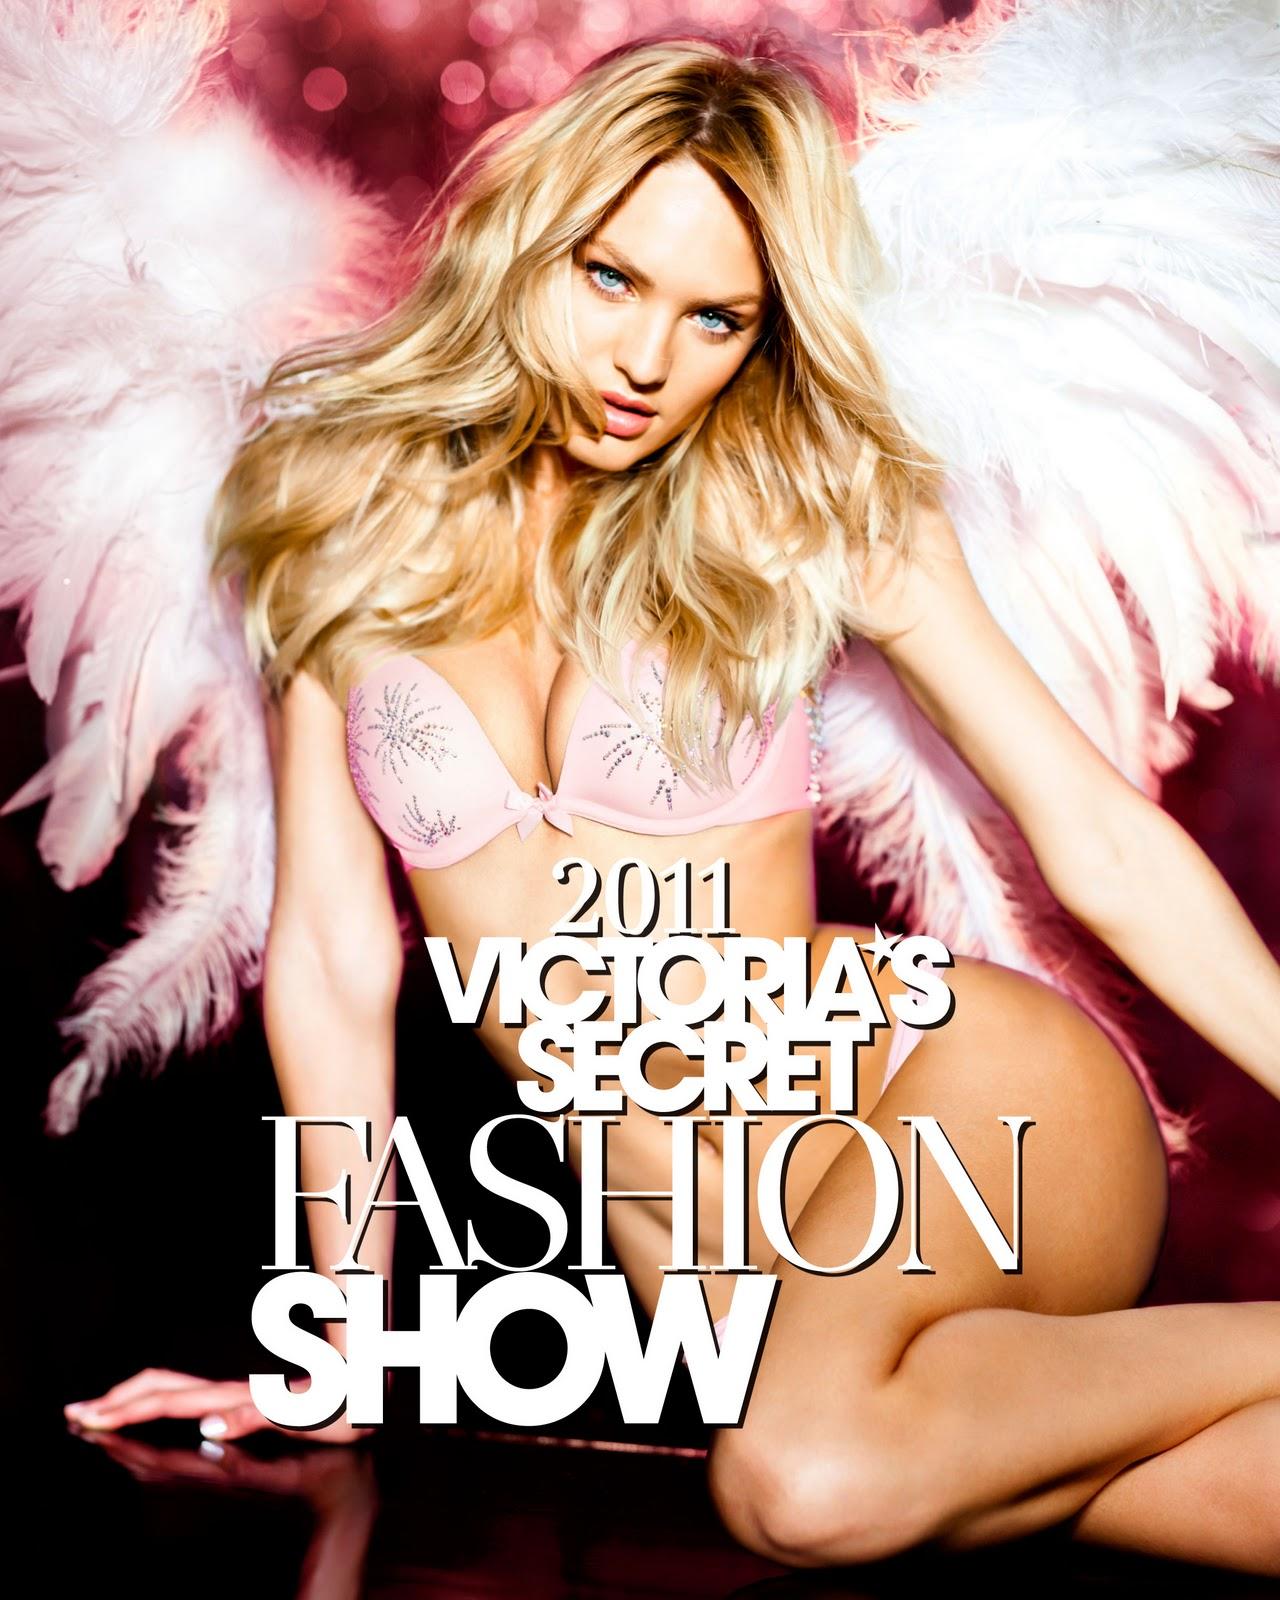 http://1.bp.blogspot.com/-H8aWOfmnHBM/TrjiHXhwuAI/AAAAAAAAA_c/mnAbIGf-IuY/s1600/fashion-show-2011-announce-candice-bra-panty-victorias-secret-hi-res1.jpg